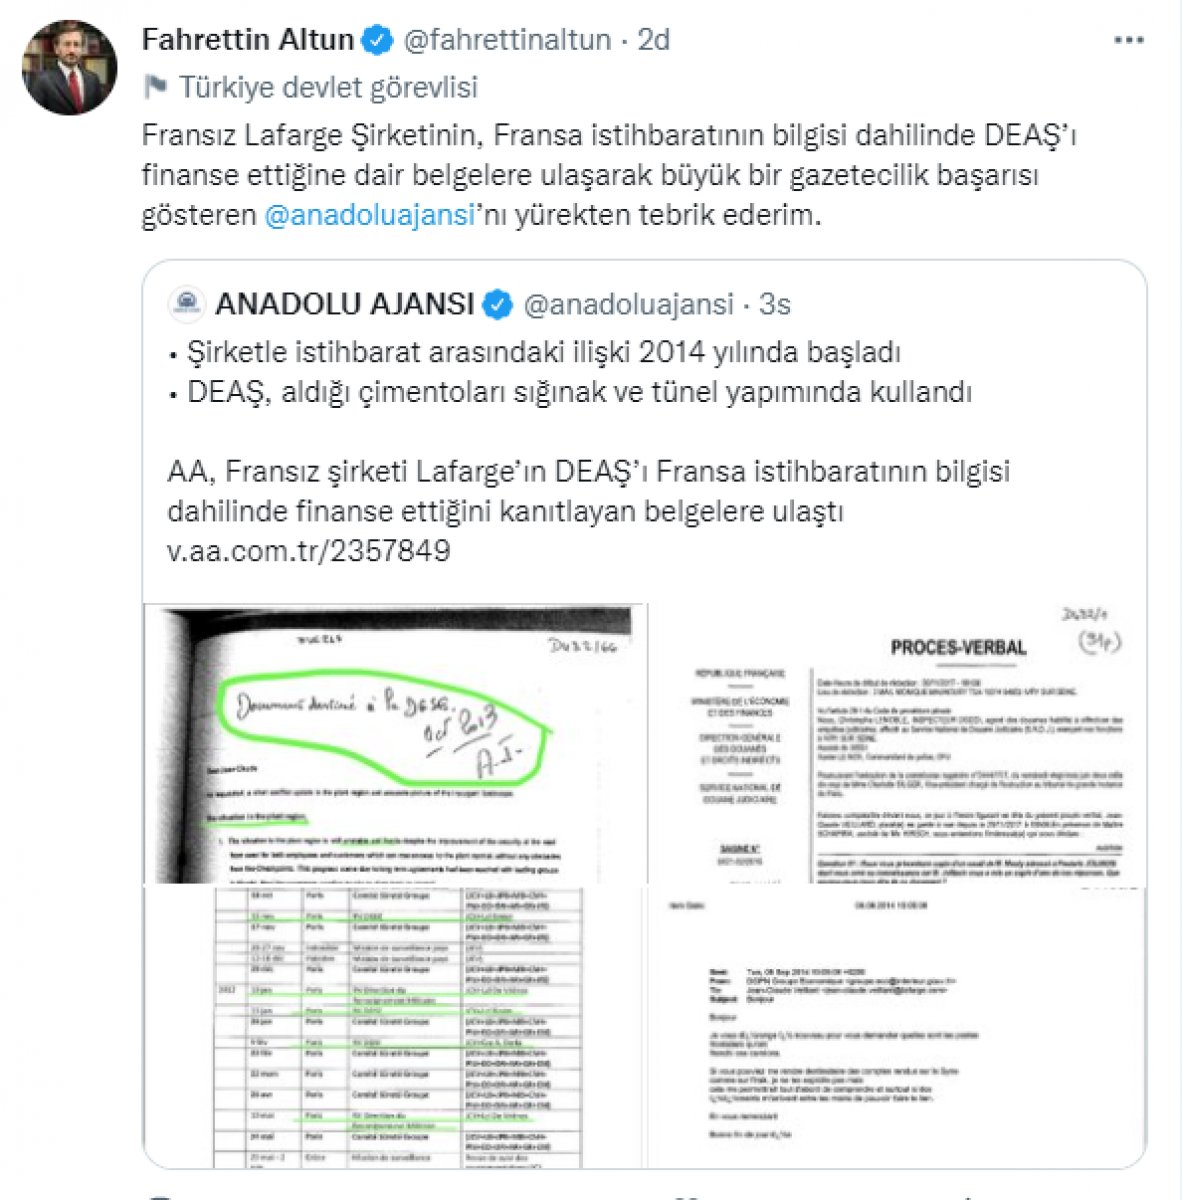 Fahrettin Altun dan Anadolu Ajansı na tebrik #1